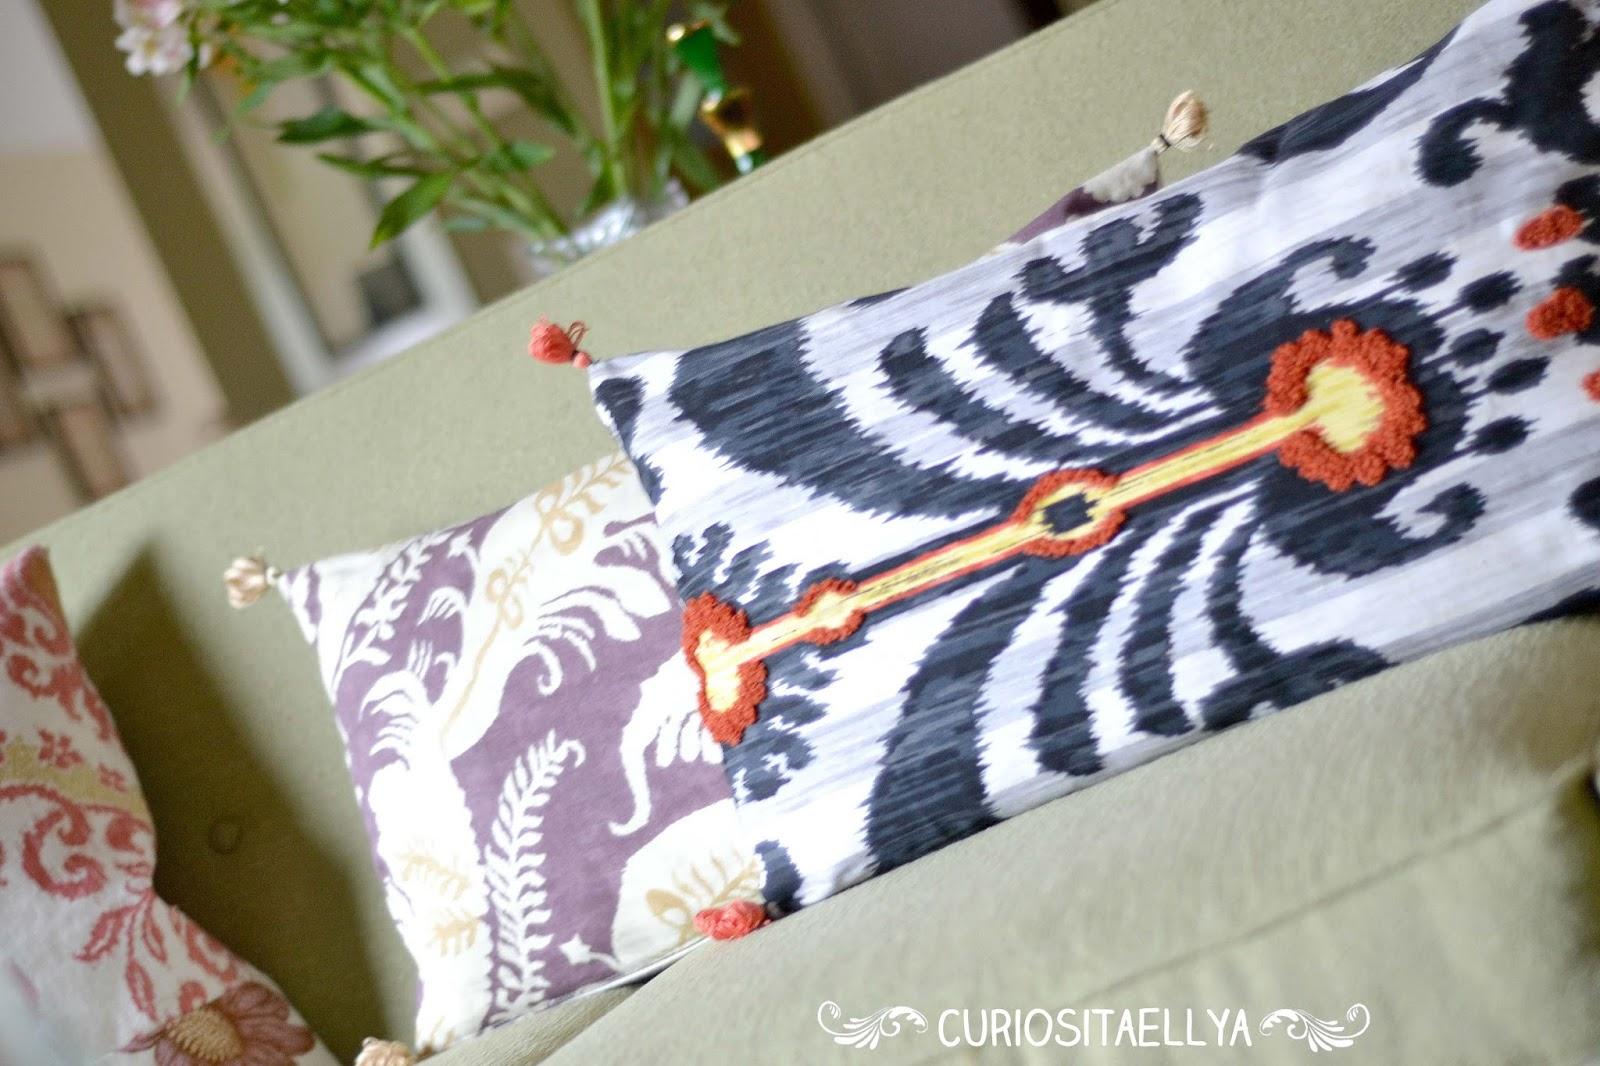 Floor Pillows Anthropologie : Curiositaellya: Home Made Anthro Inspired Throw Pillows {DIY}